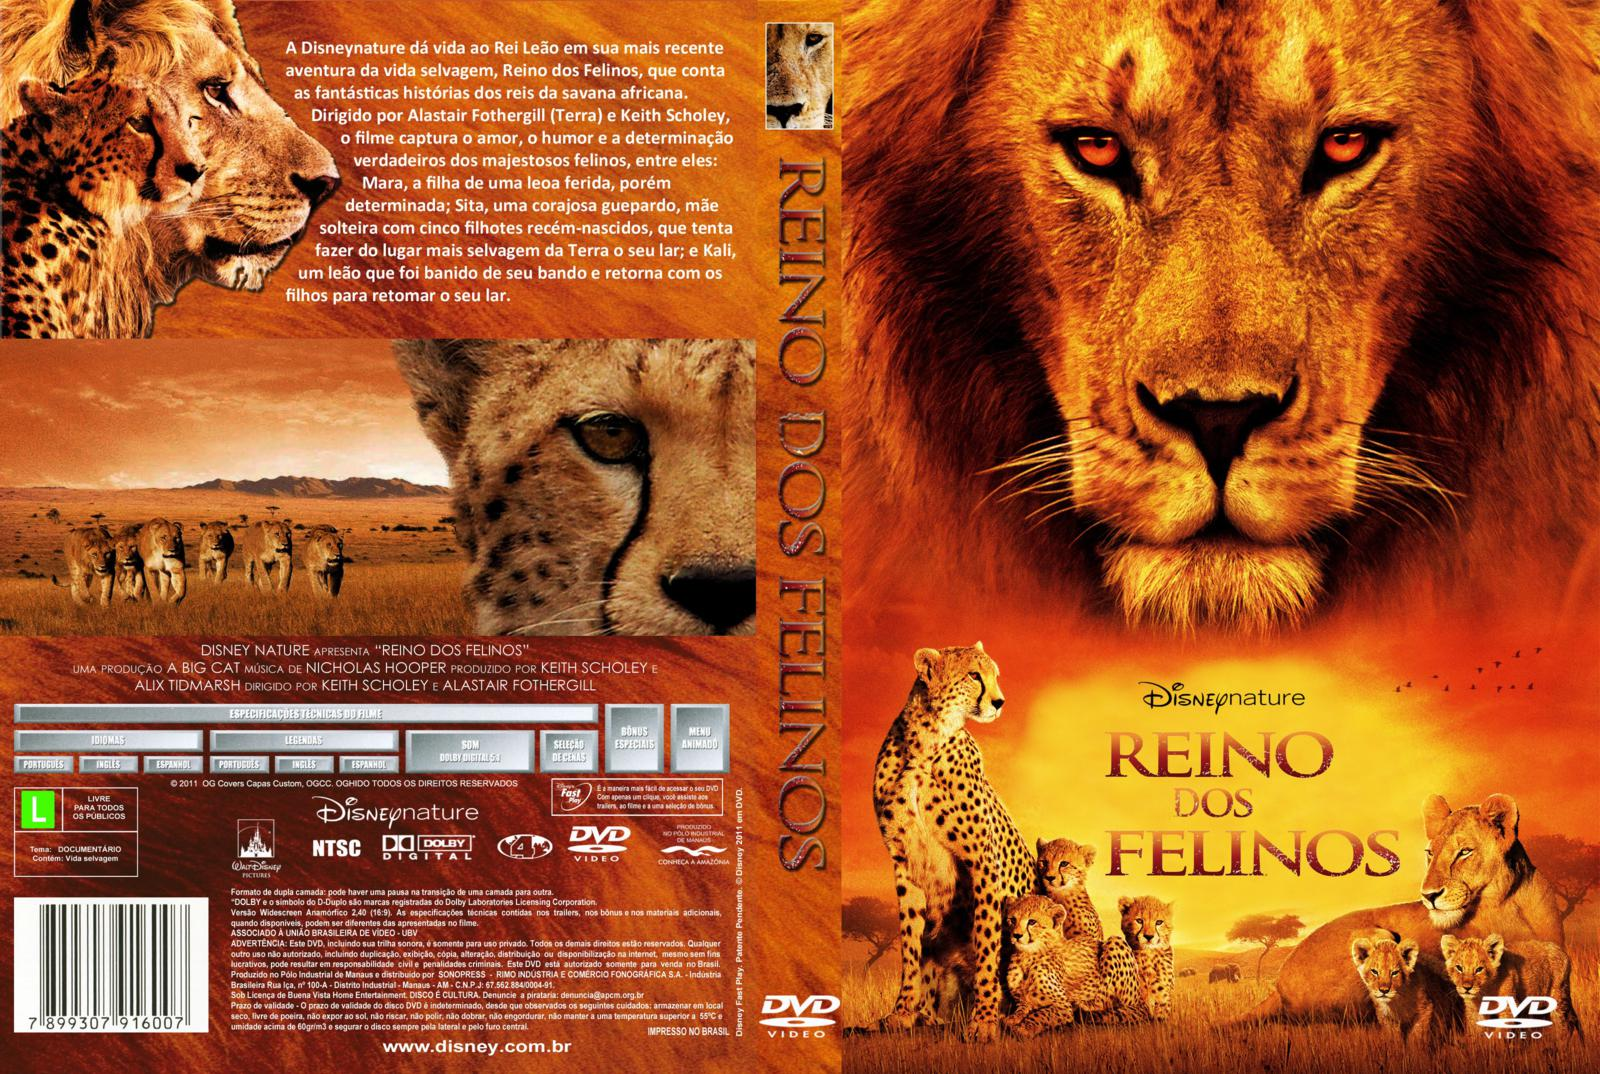 Reino Dos Felinos DVDRip XviD Dual Áudio Reino 2BDos 2BFelinos 2BDVD 2BXANDAO 2BDOWNLOAD